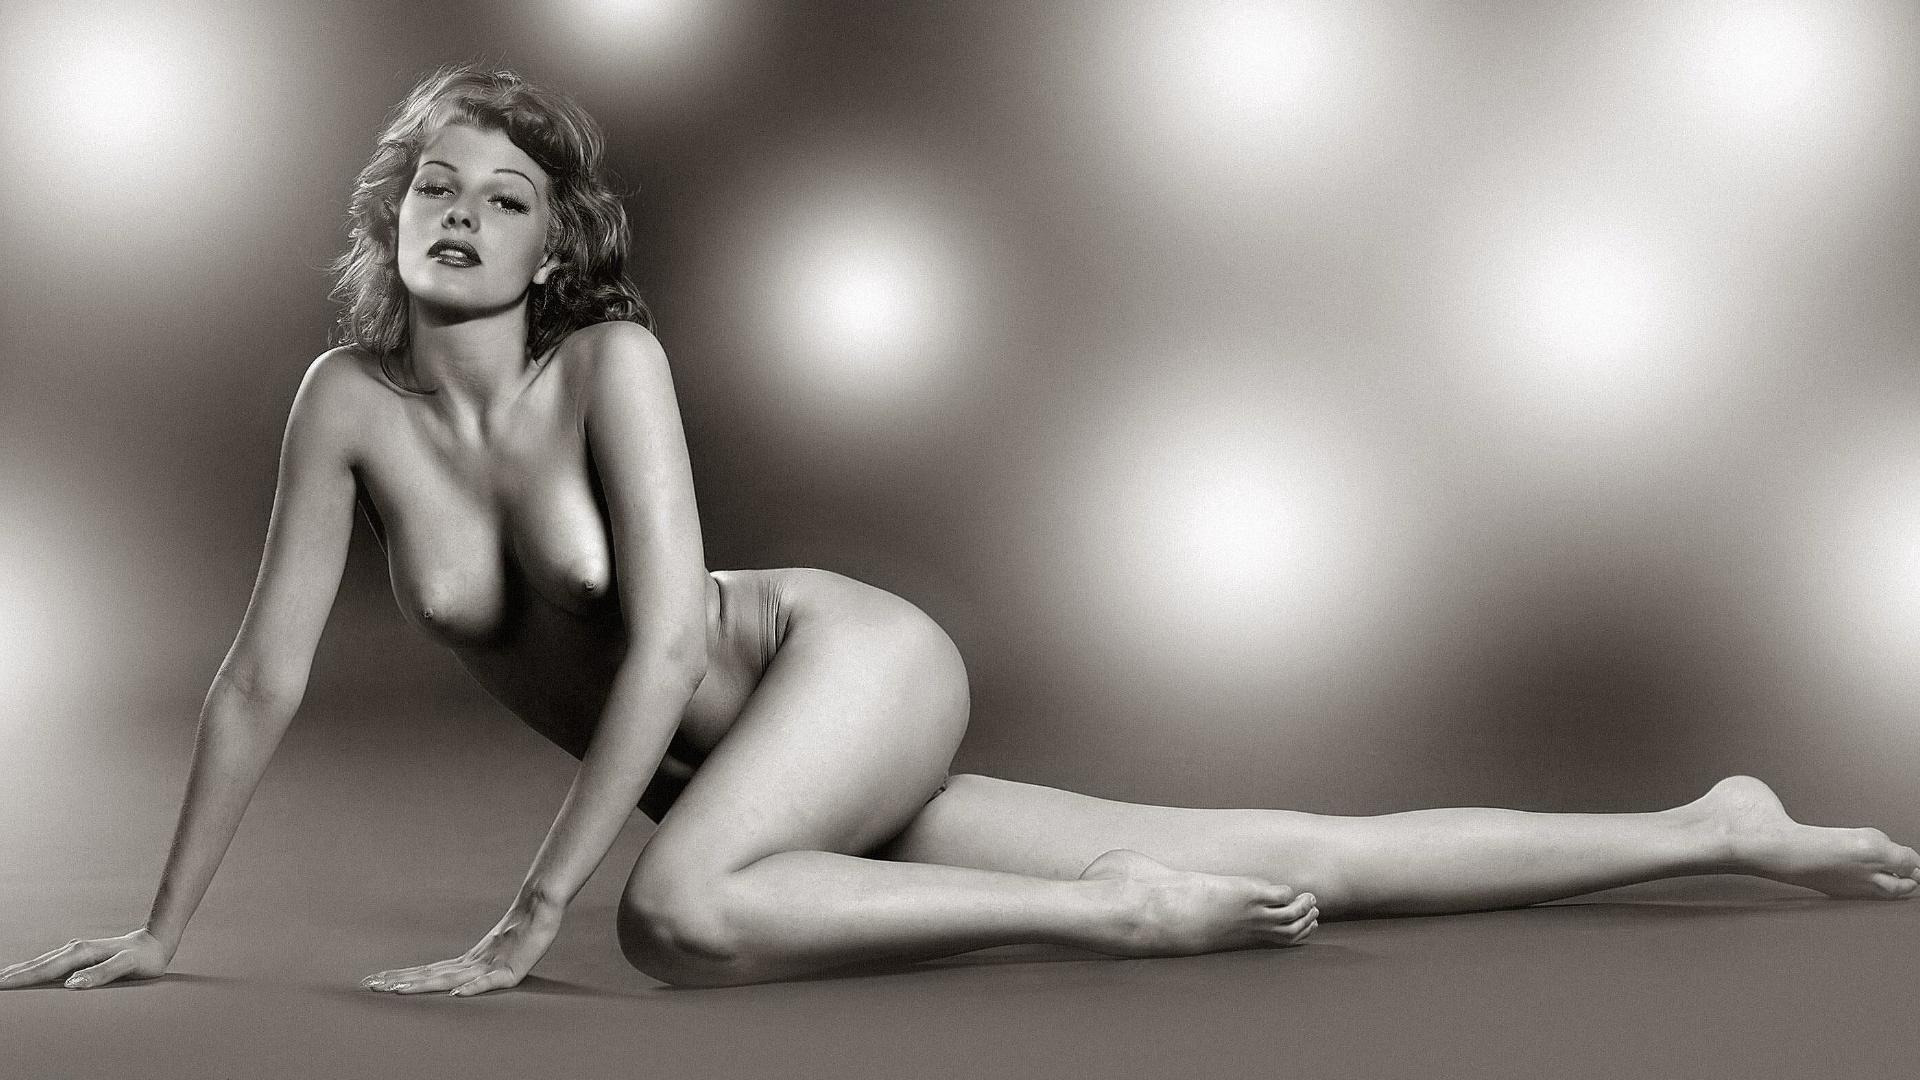 Rita hayworth porn nude scene